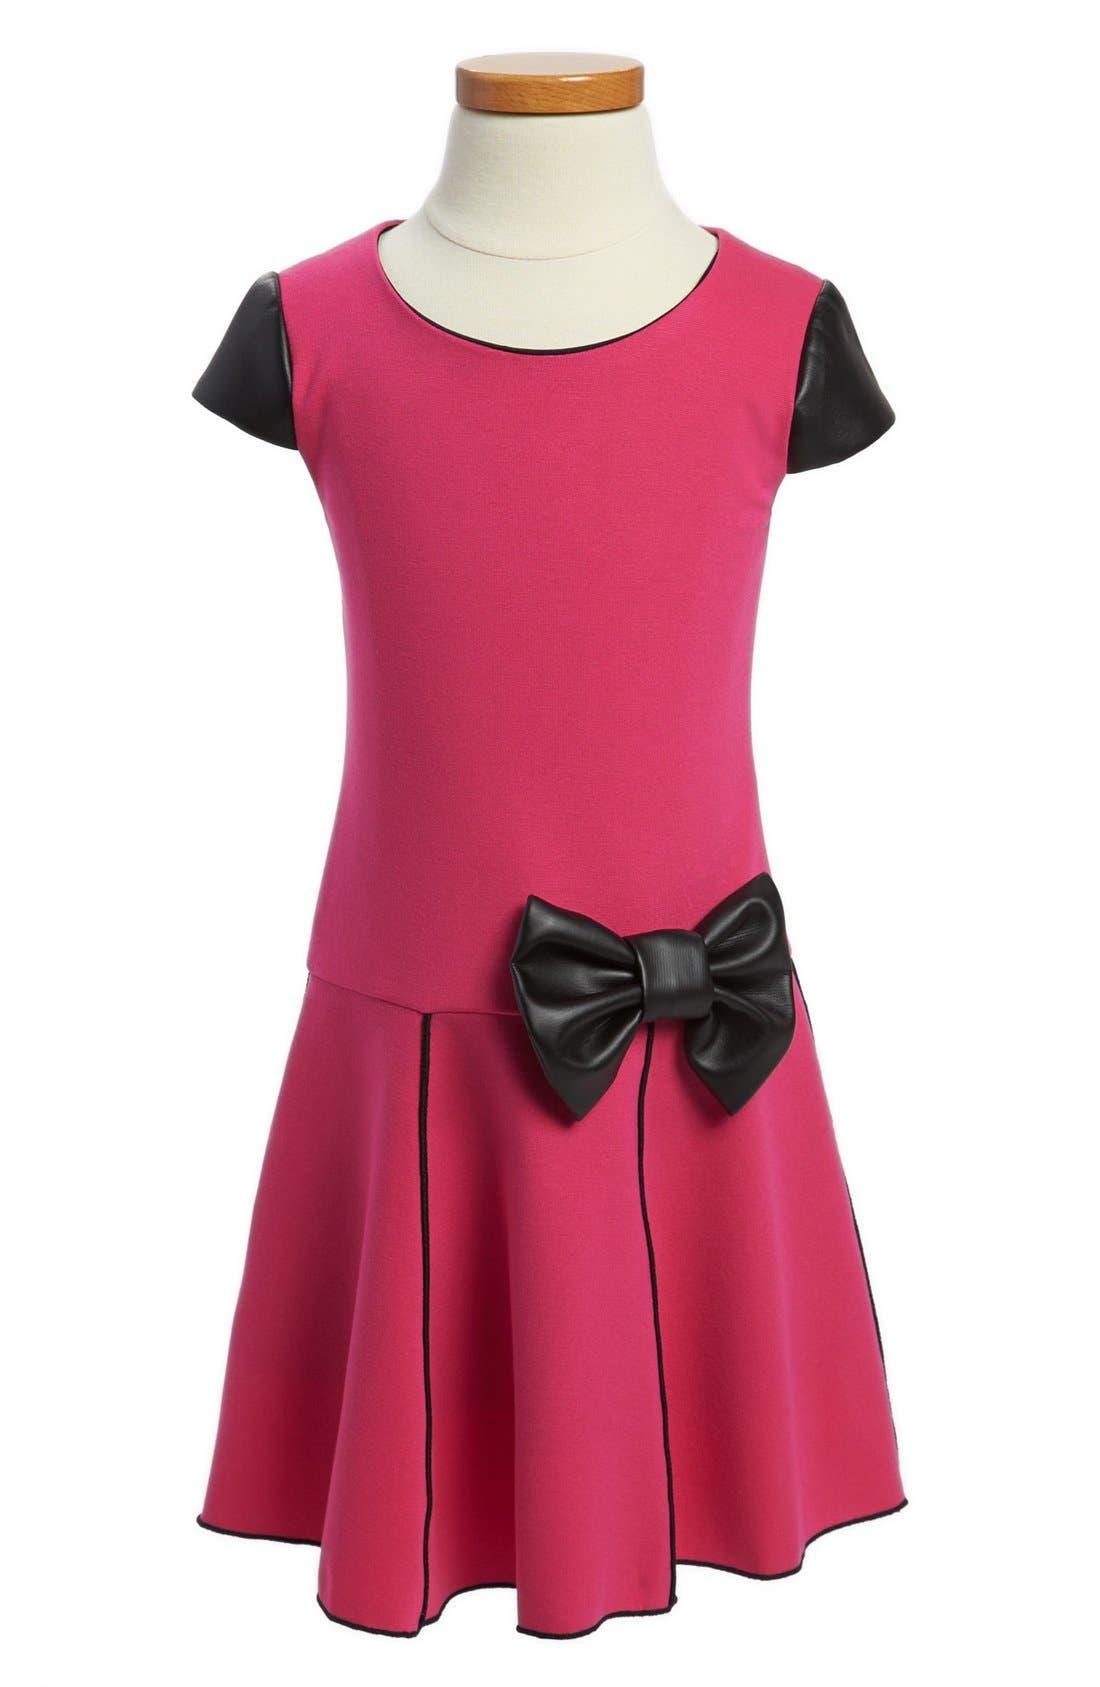 Alternate Image 1 Selected - Zoe Ltd Faux Leather Trim Dress (Little Girls & Big Girls)